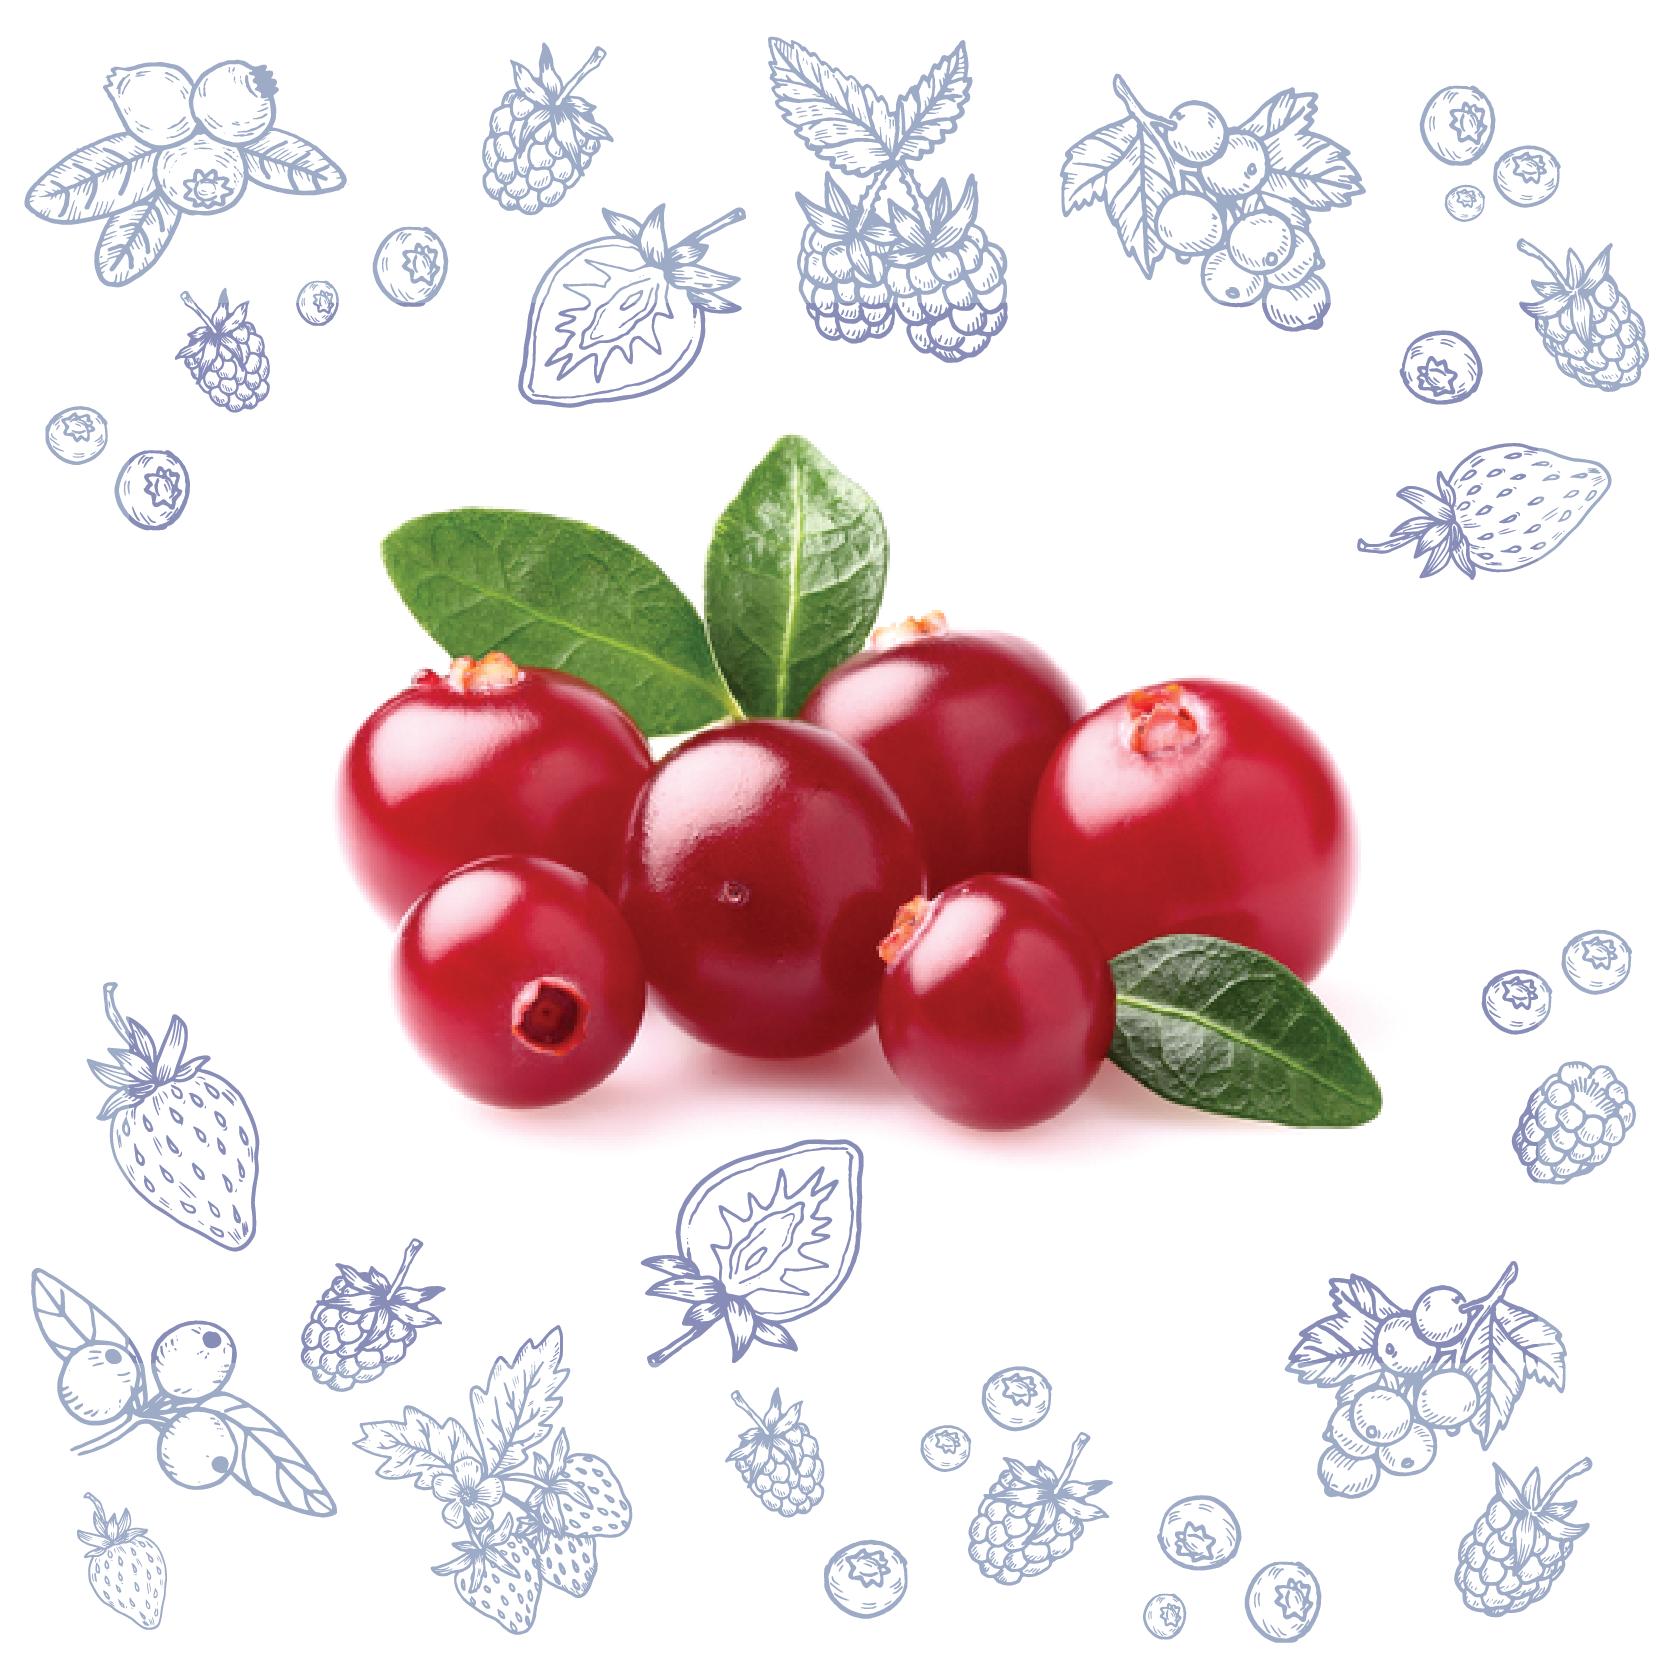 Polarica-Berries-lingon